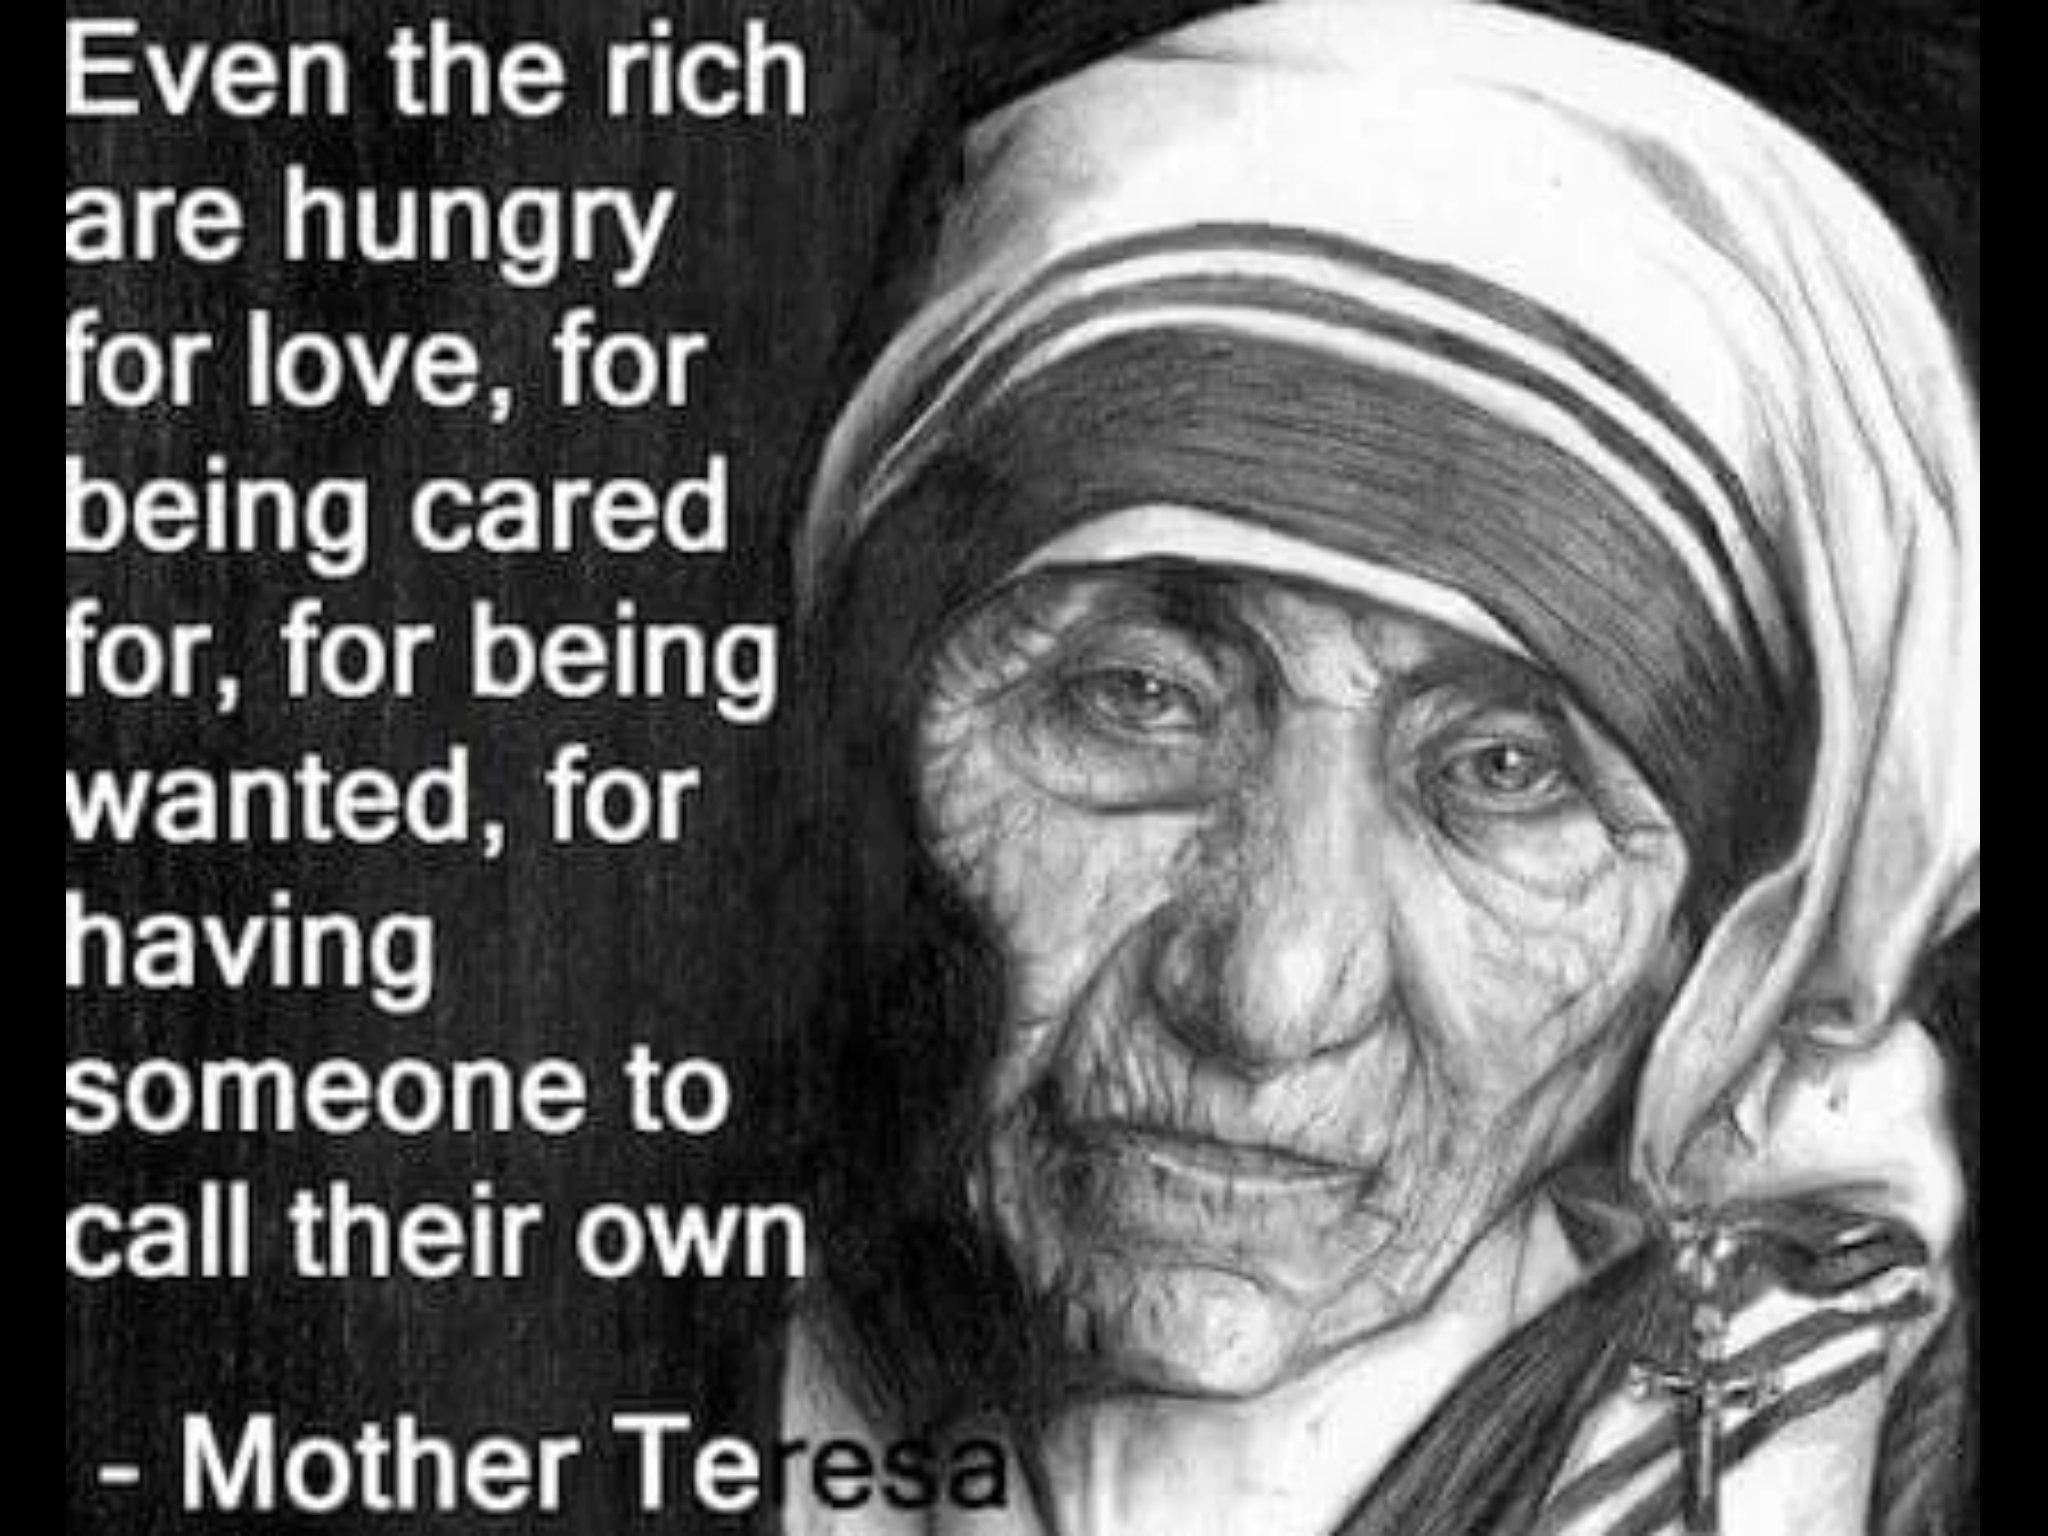 Even the rich.jpg